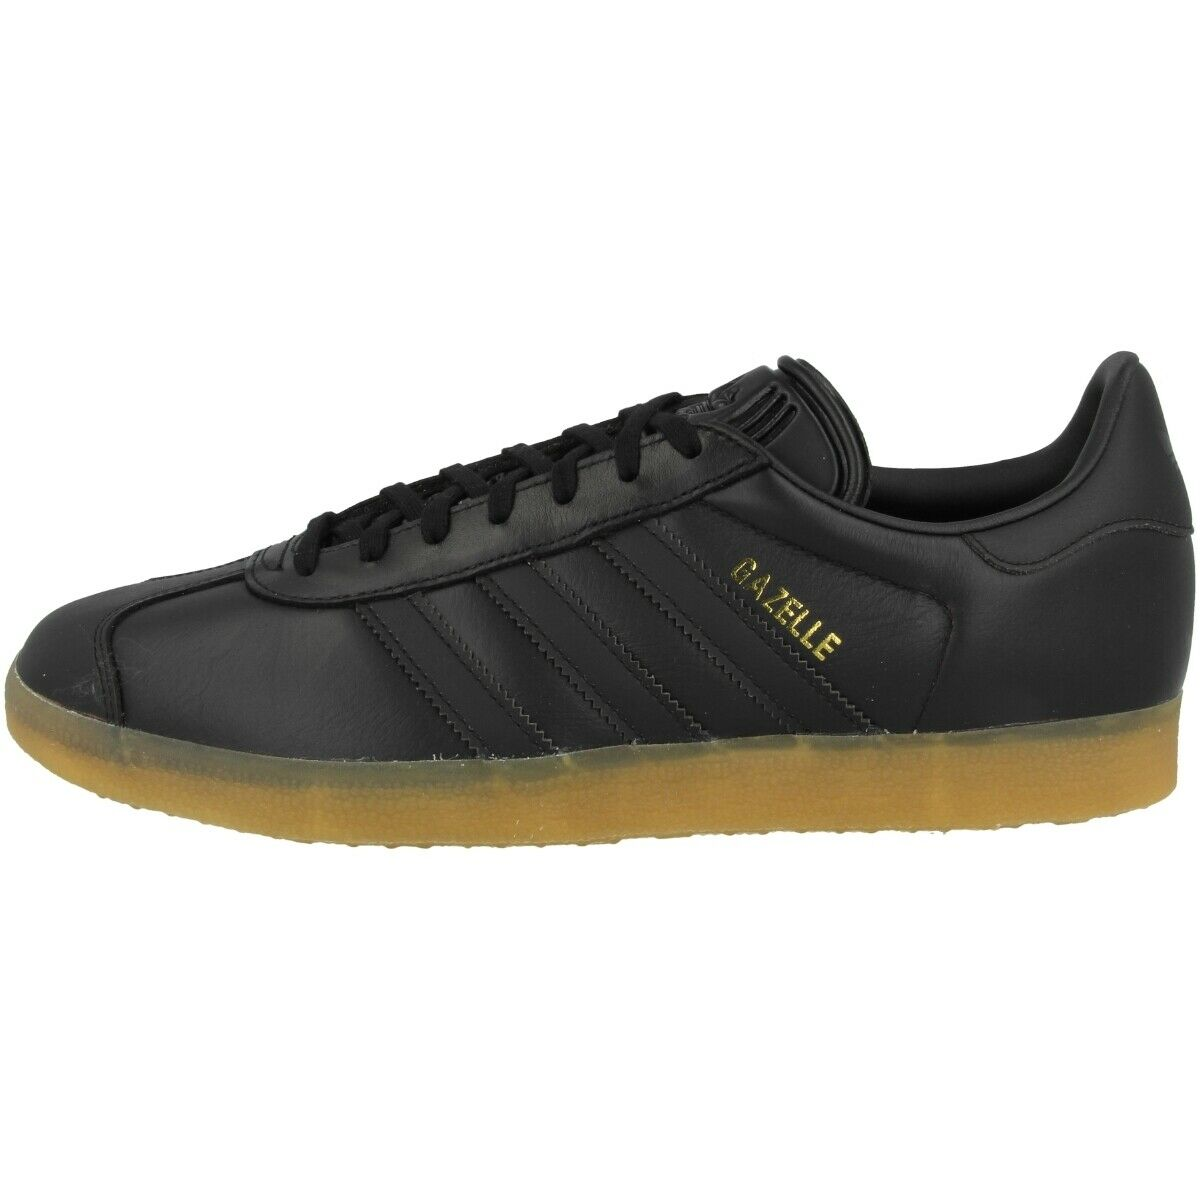 Adidas Gazelle Chaussures Rétro Loisirs baskets Hommes Baskets noir GUM bd7480